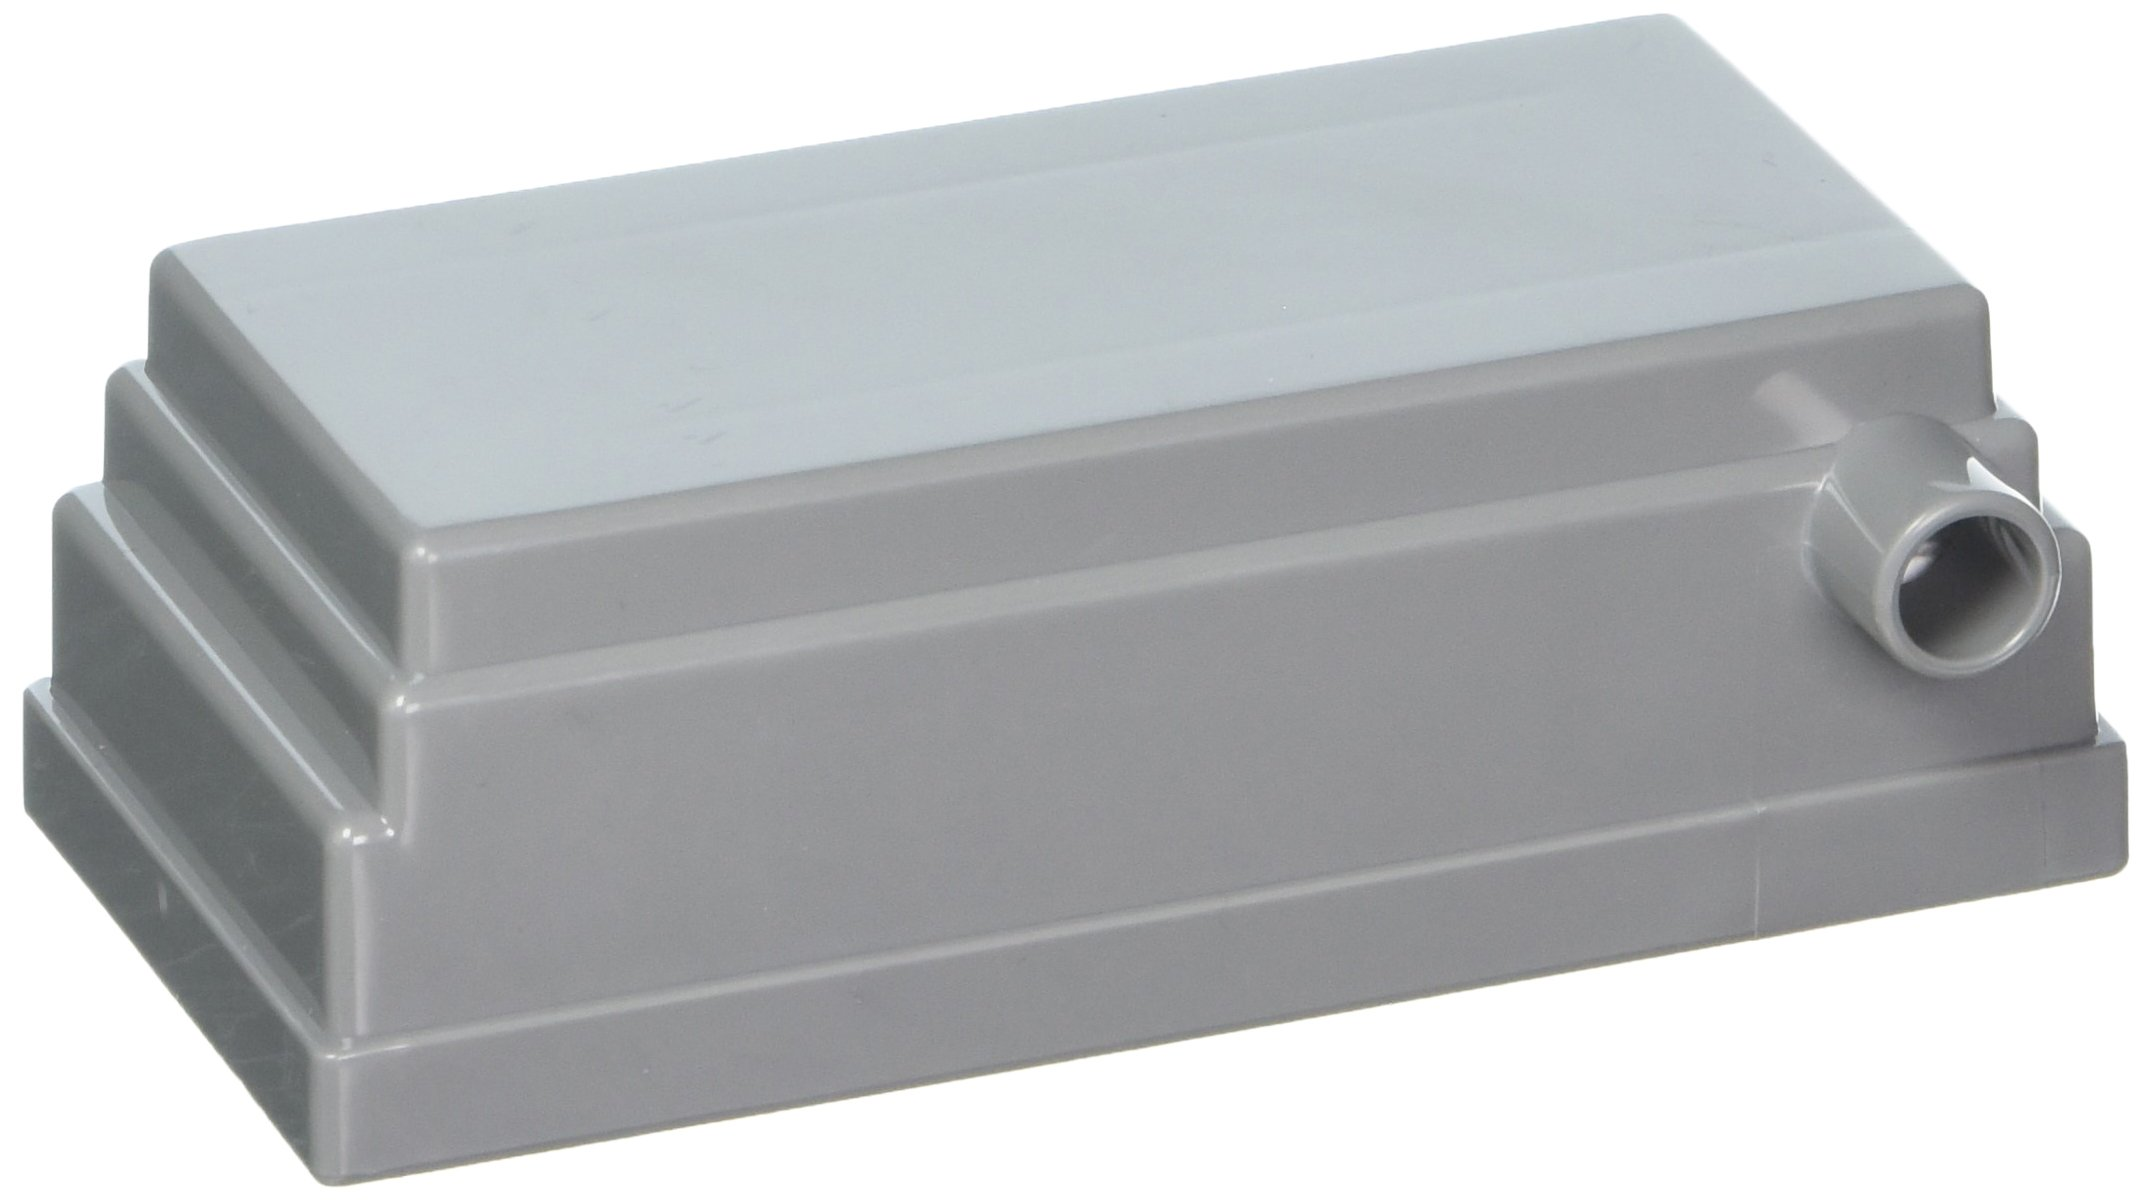 Respironics EverFlo Inlet Filter (Pack of 5) Original OEM